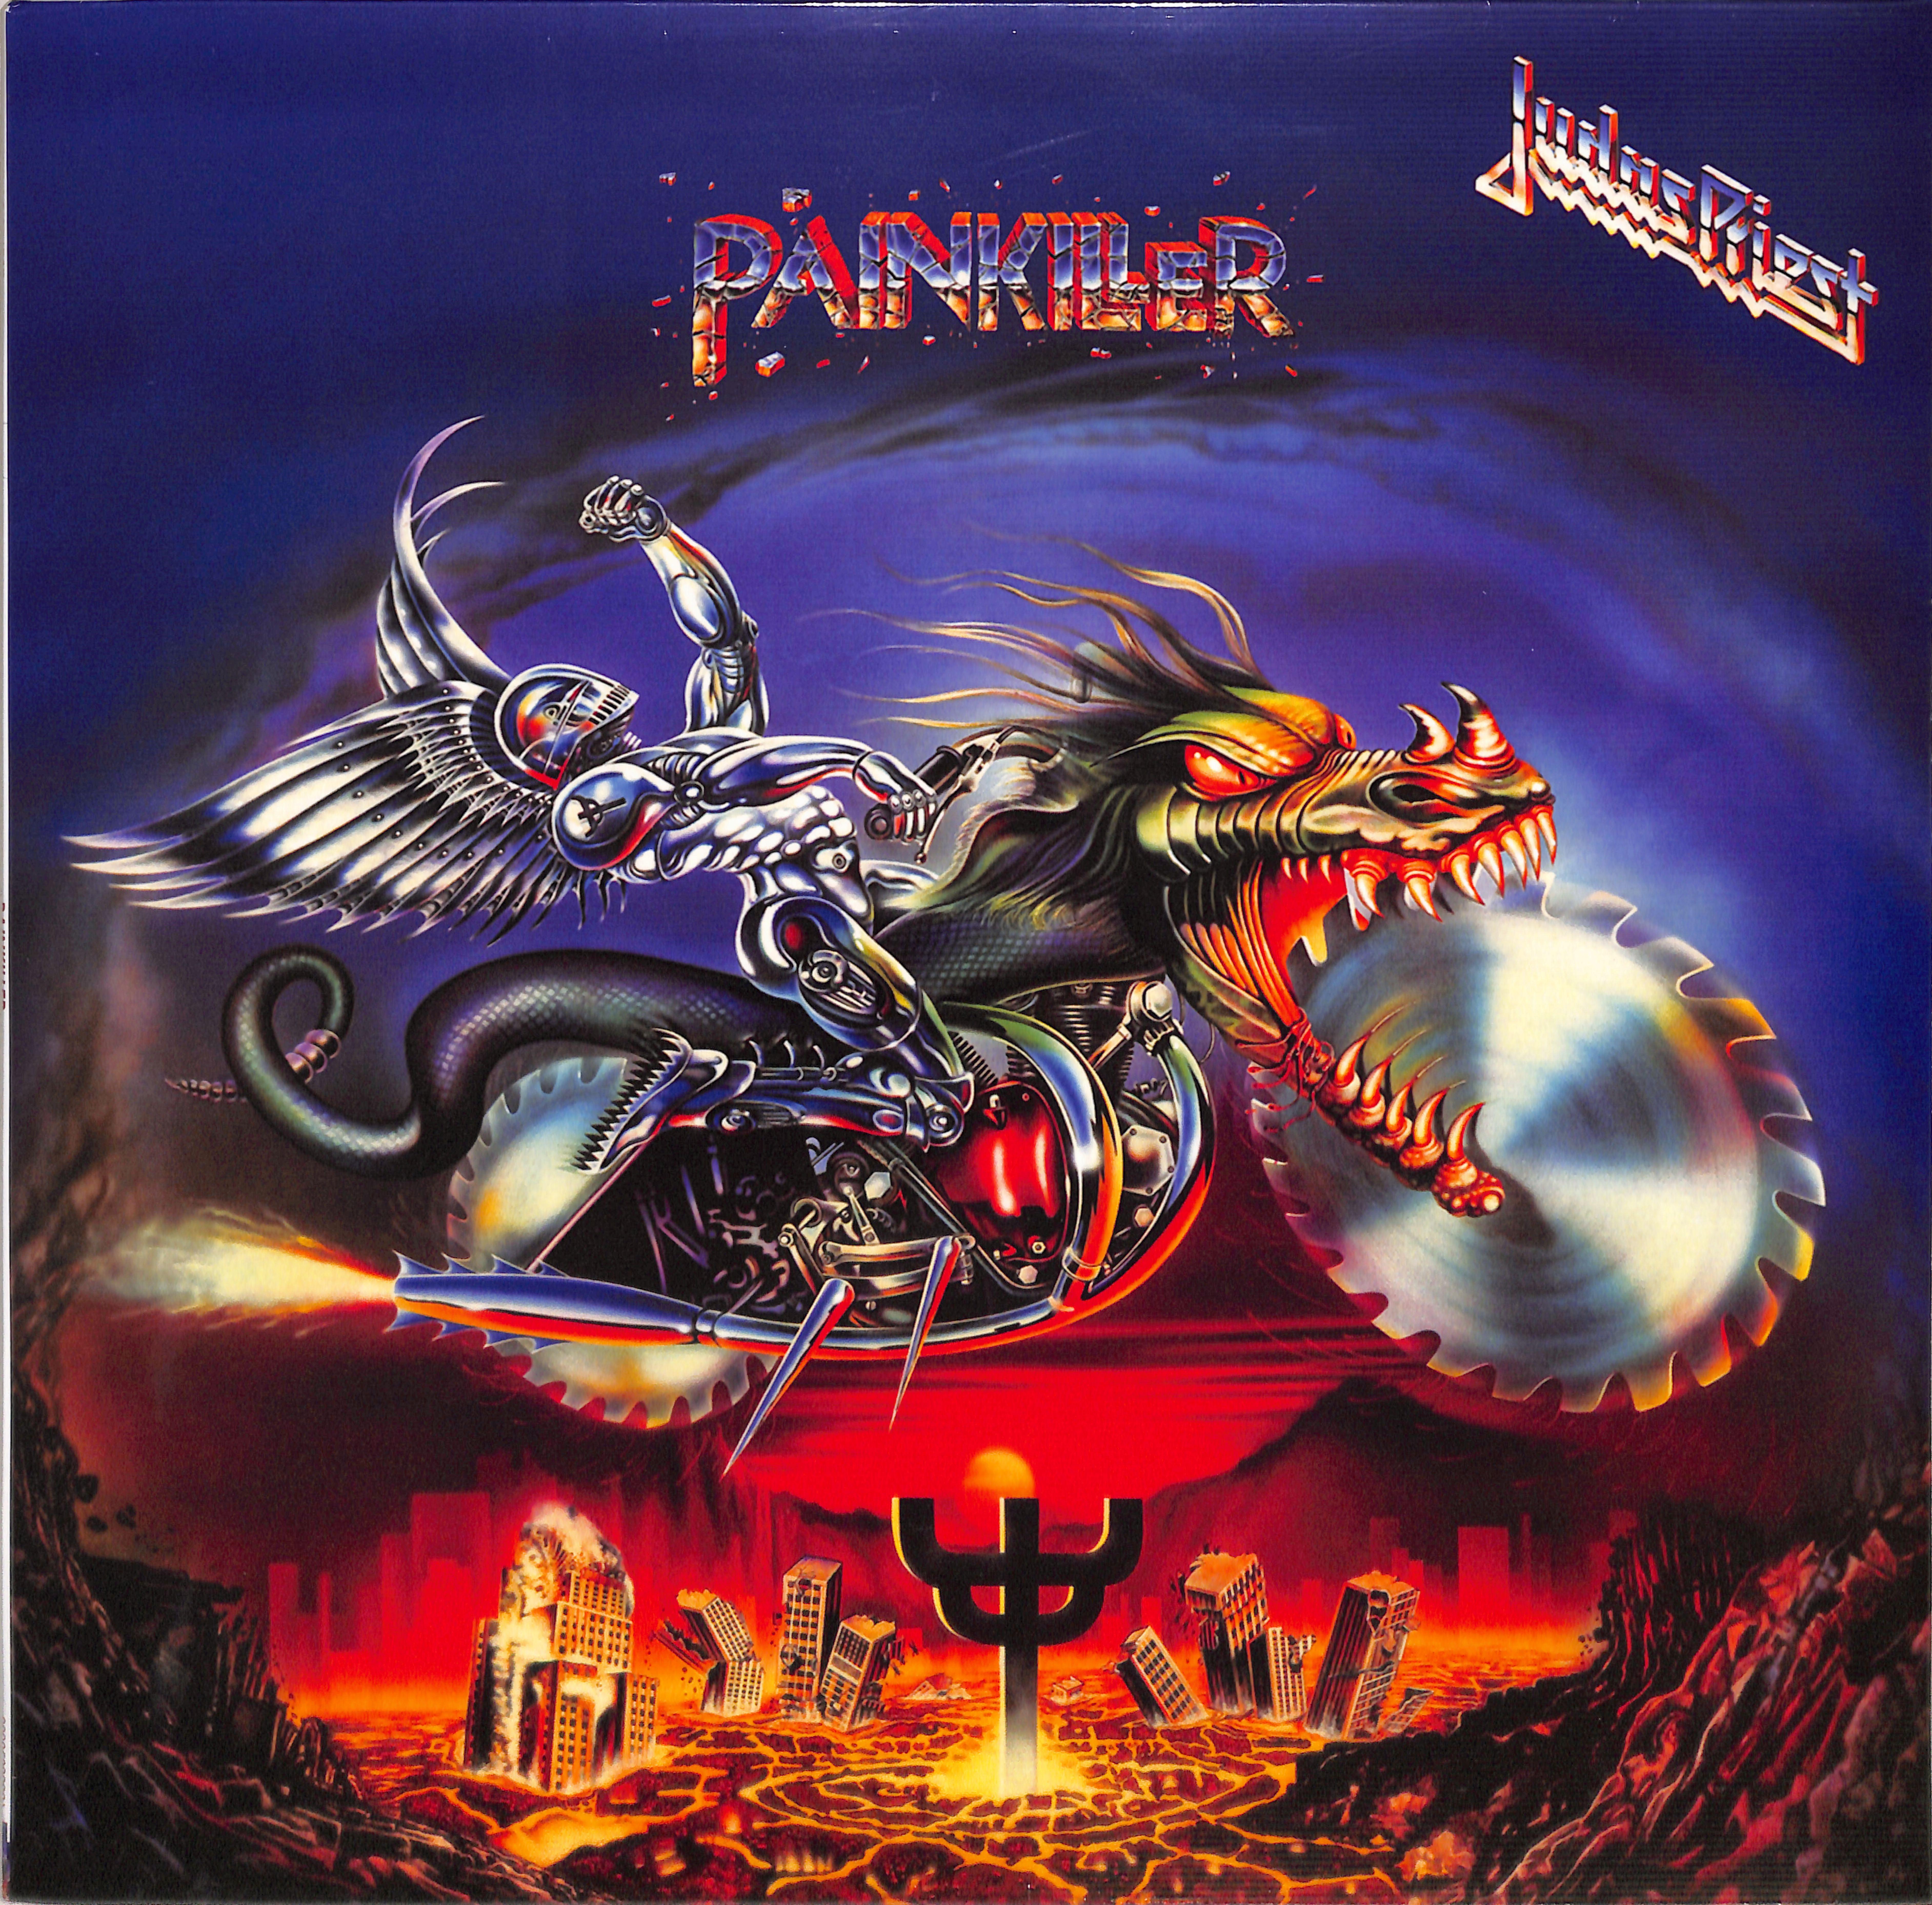 Judas Priest Painkiller Decks De Vinyl Shop